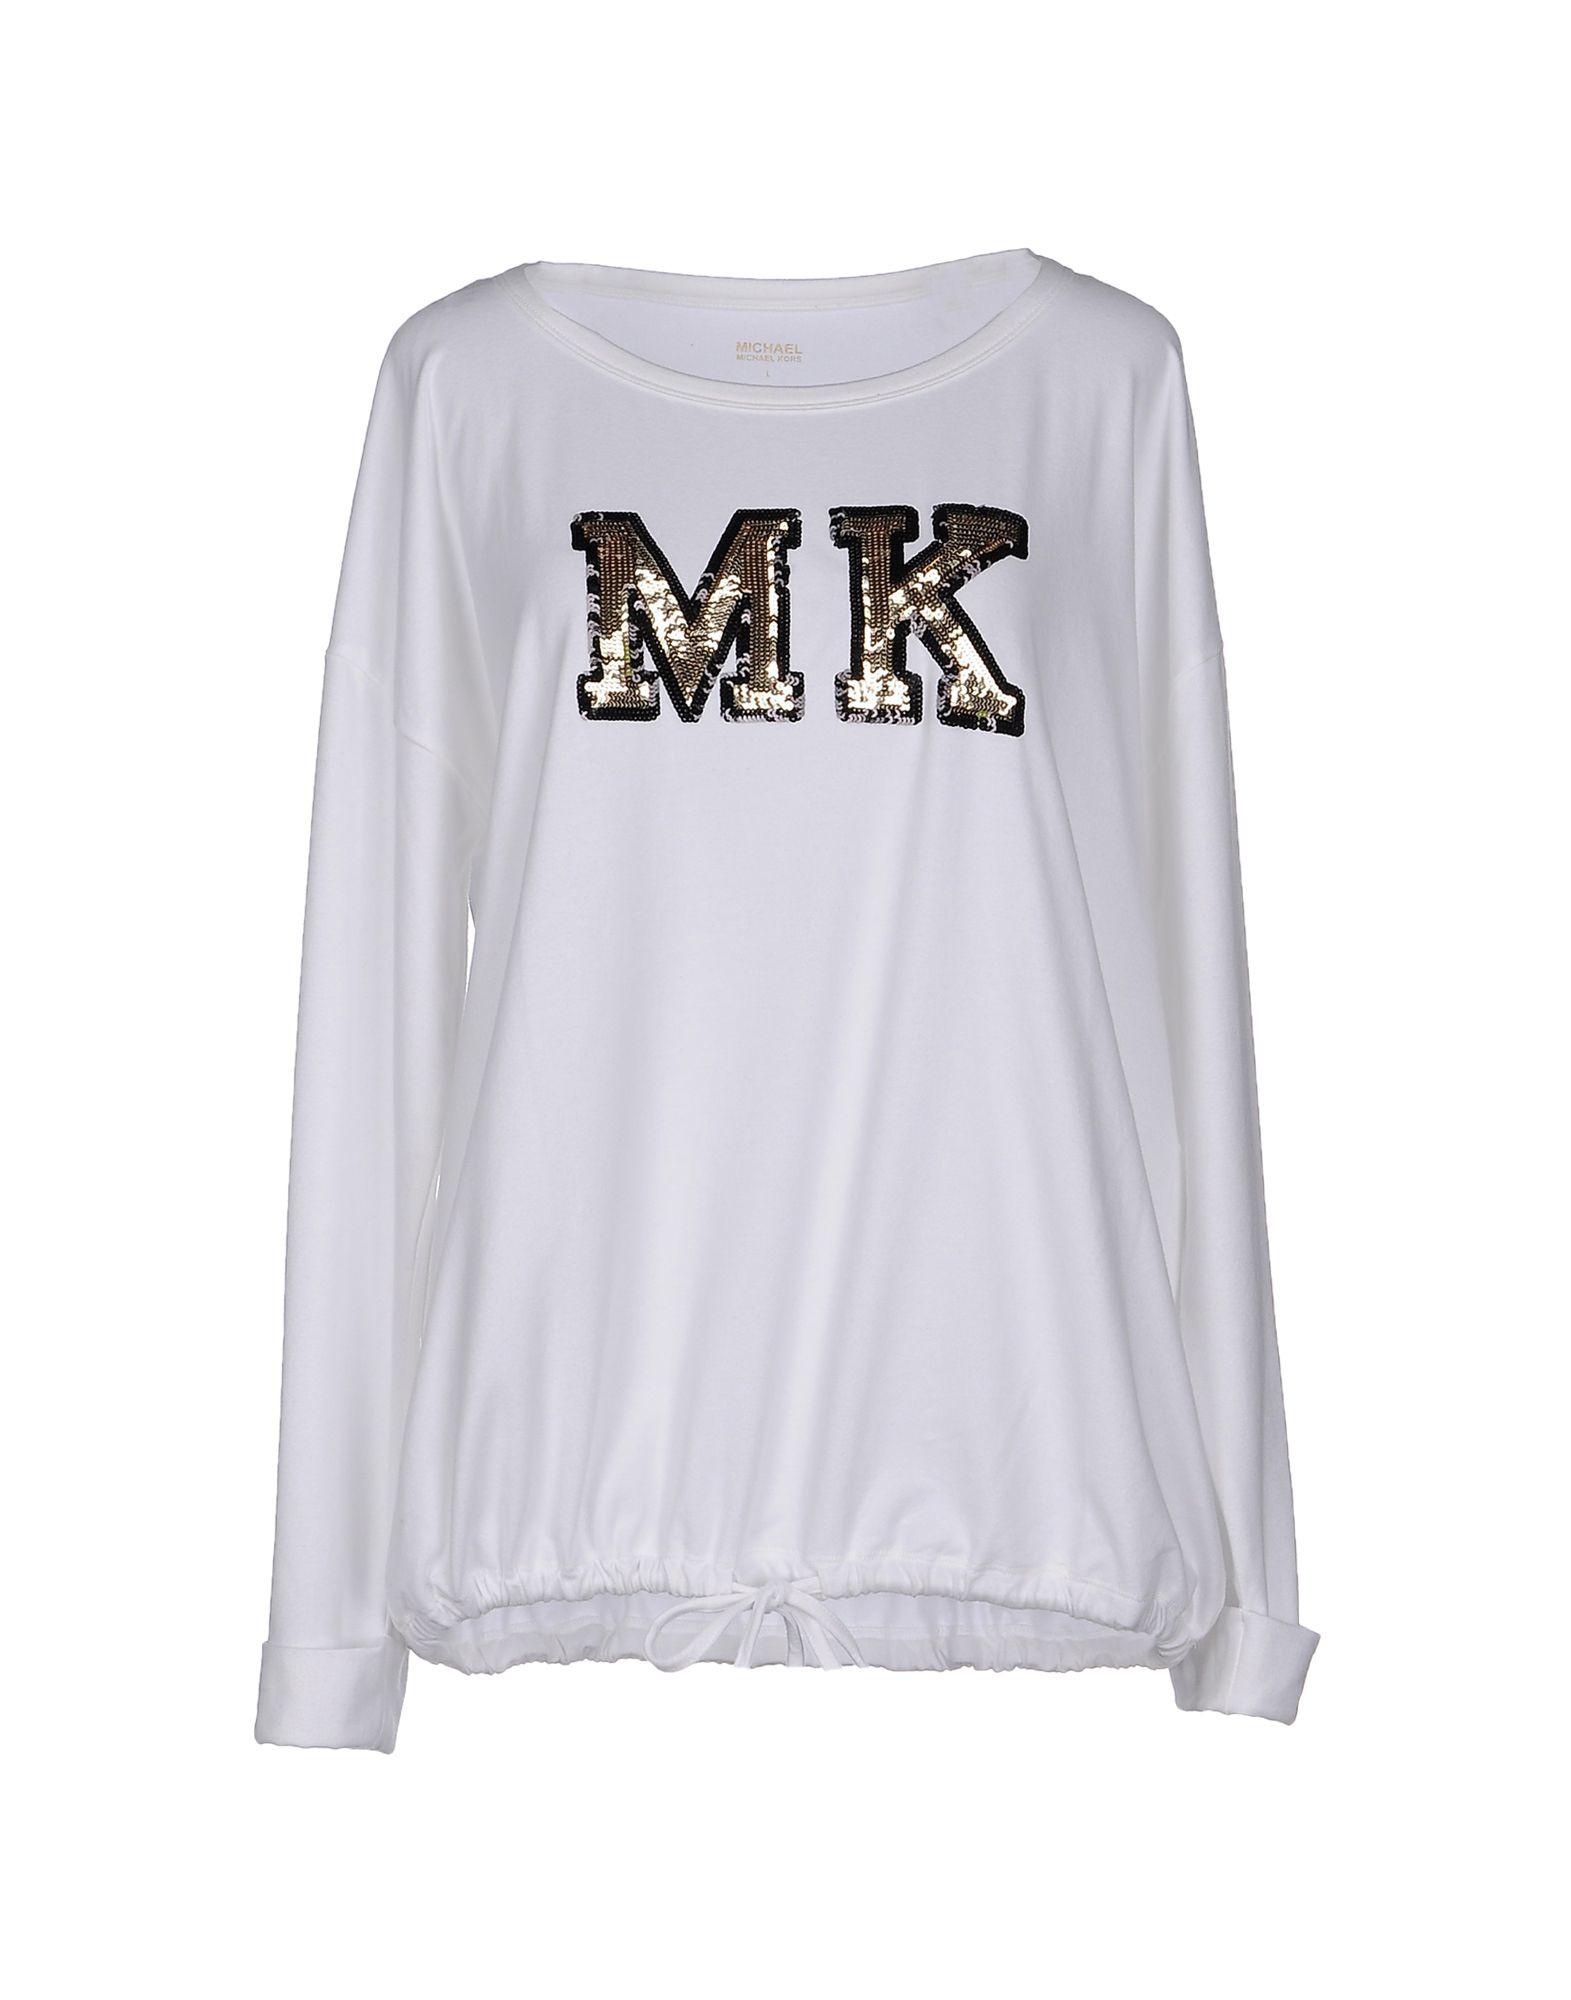 michael michael kors t shirt in white save 50 lyst. Black Bedroom Furniture Sets. Home Design Ideas